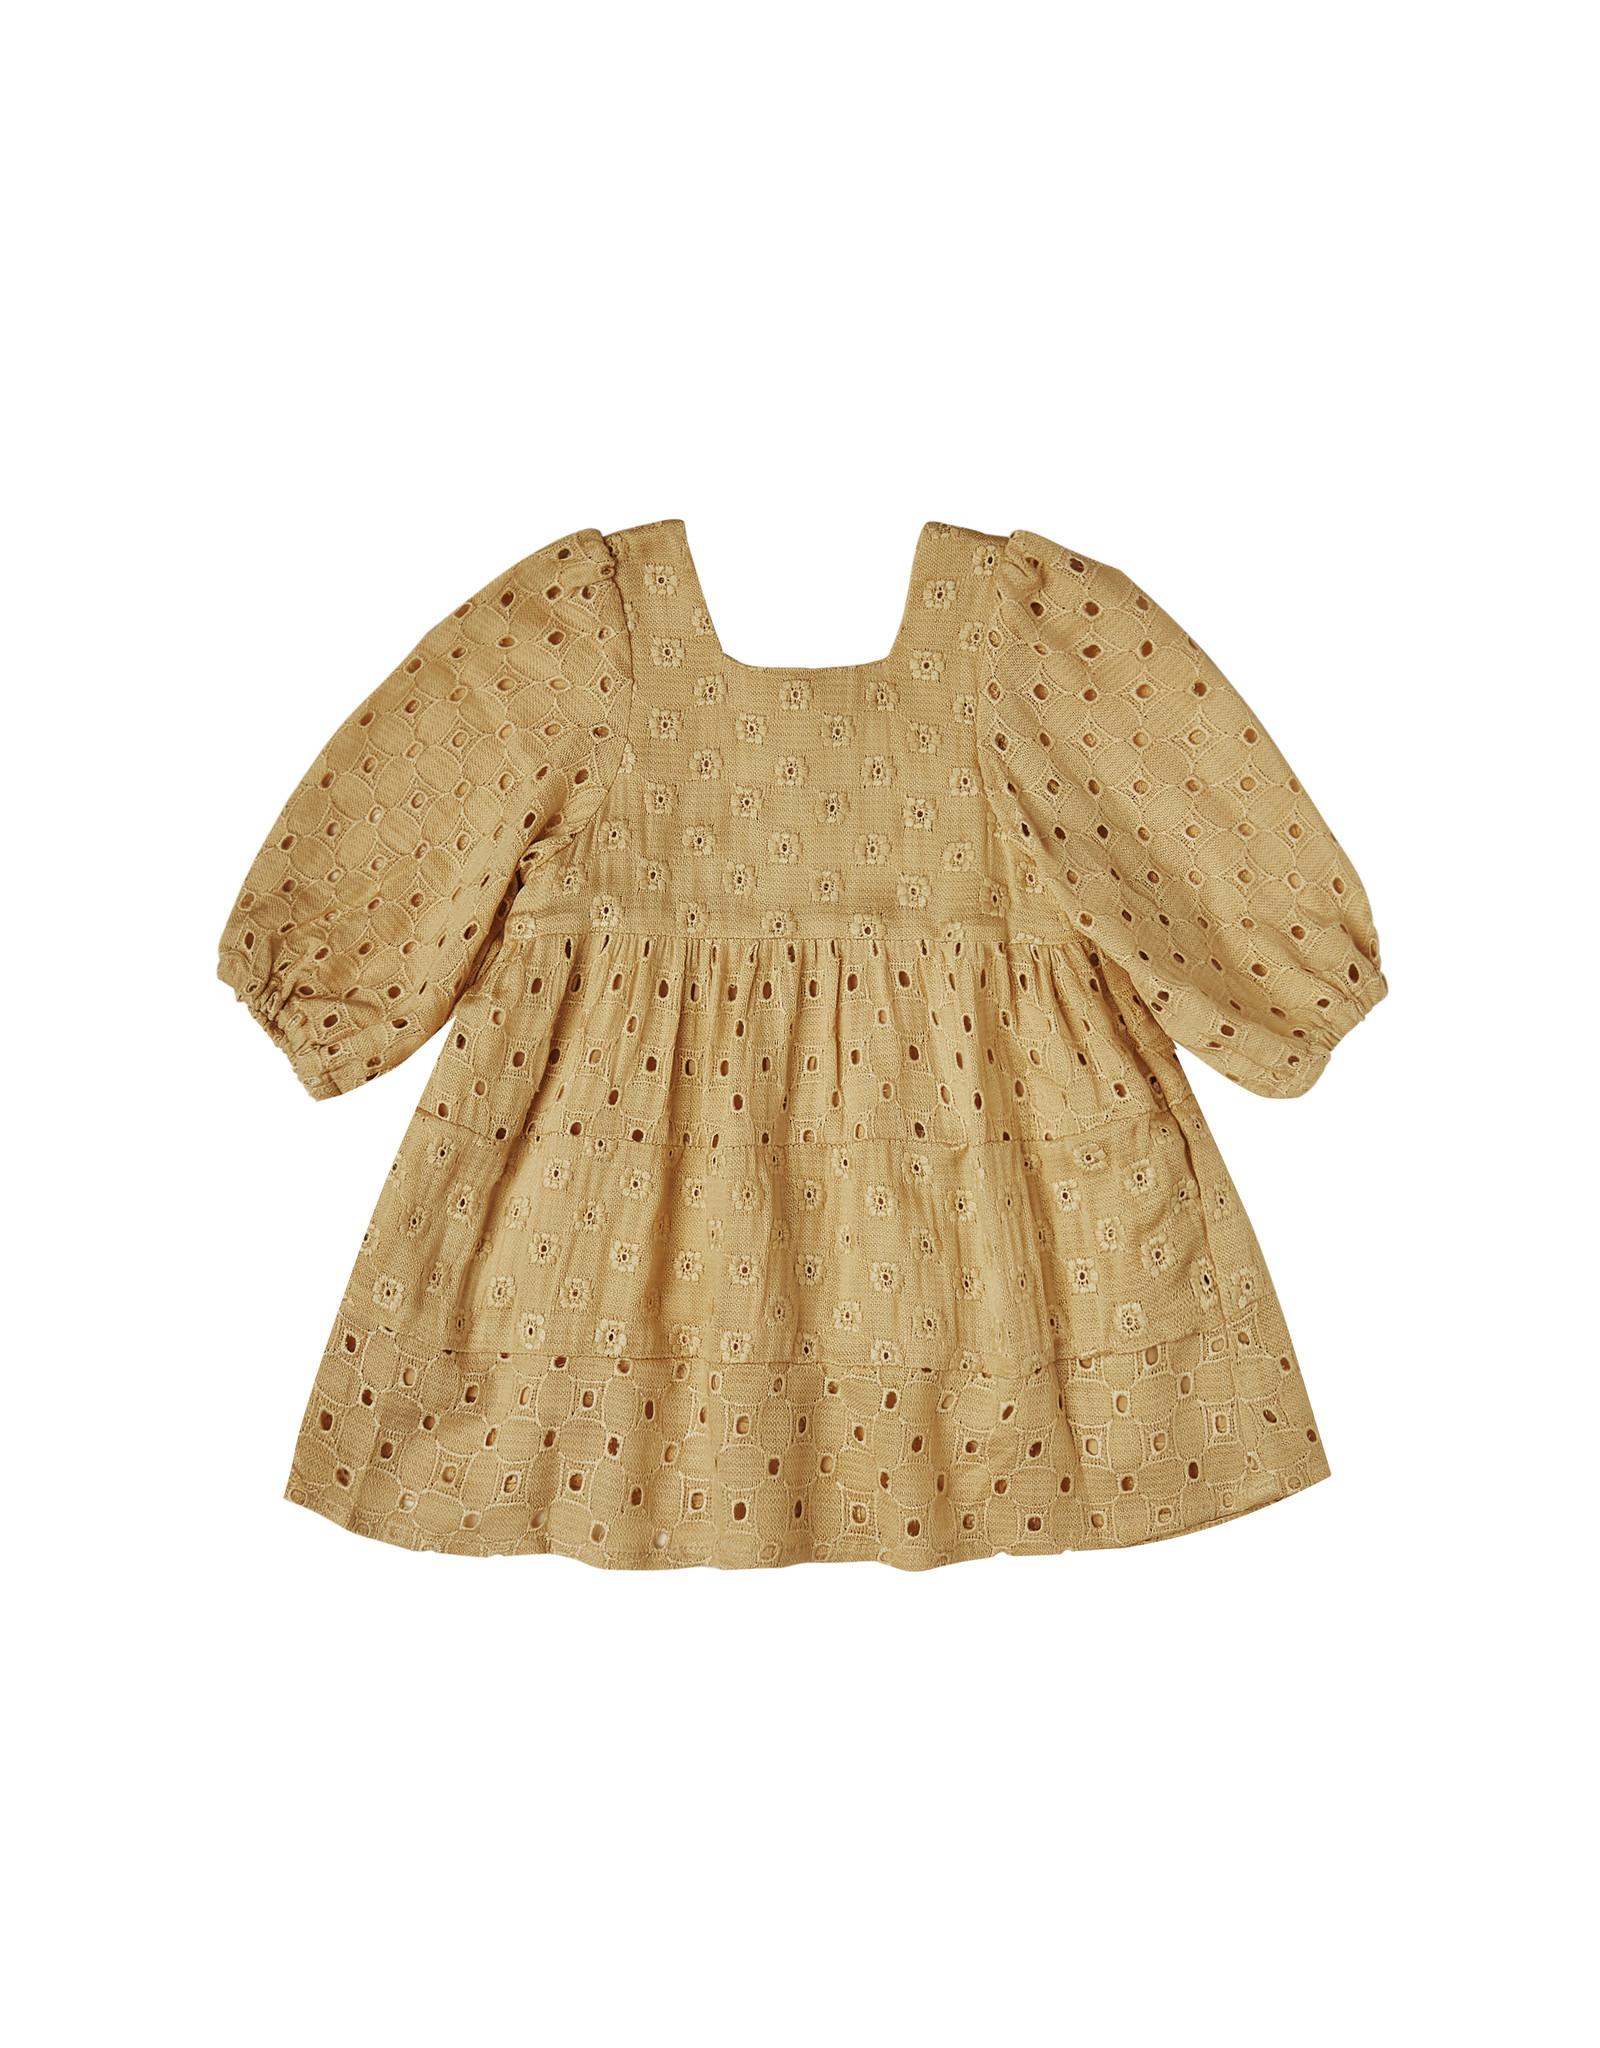 Rylee + Cru Gretta Baby Doll Dress - Goldenrod